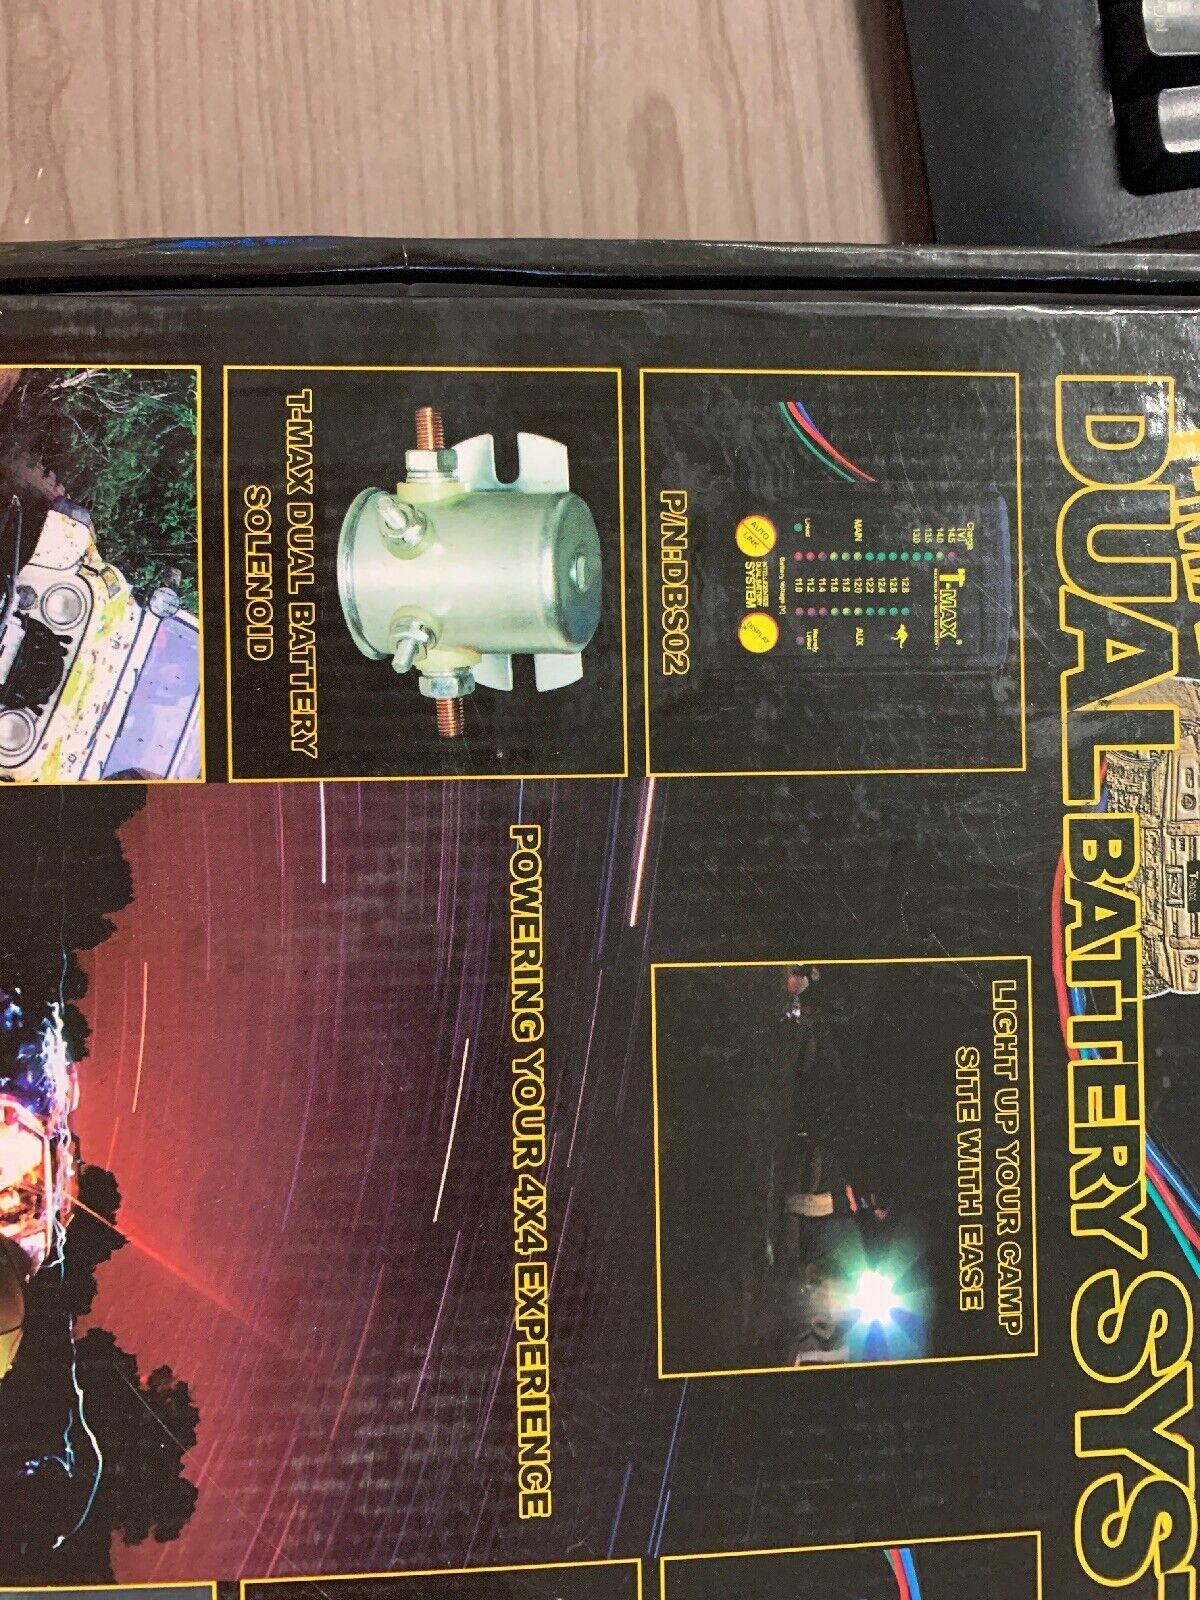 1987 Mace offroad 130029 Mace Clutch Kit With Heavy Duty Springs HONDA TRX 250R FOURTRAX 1986